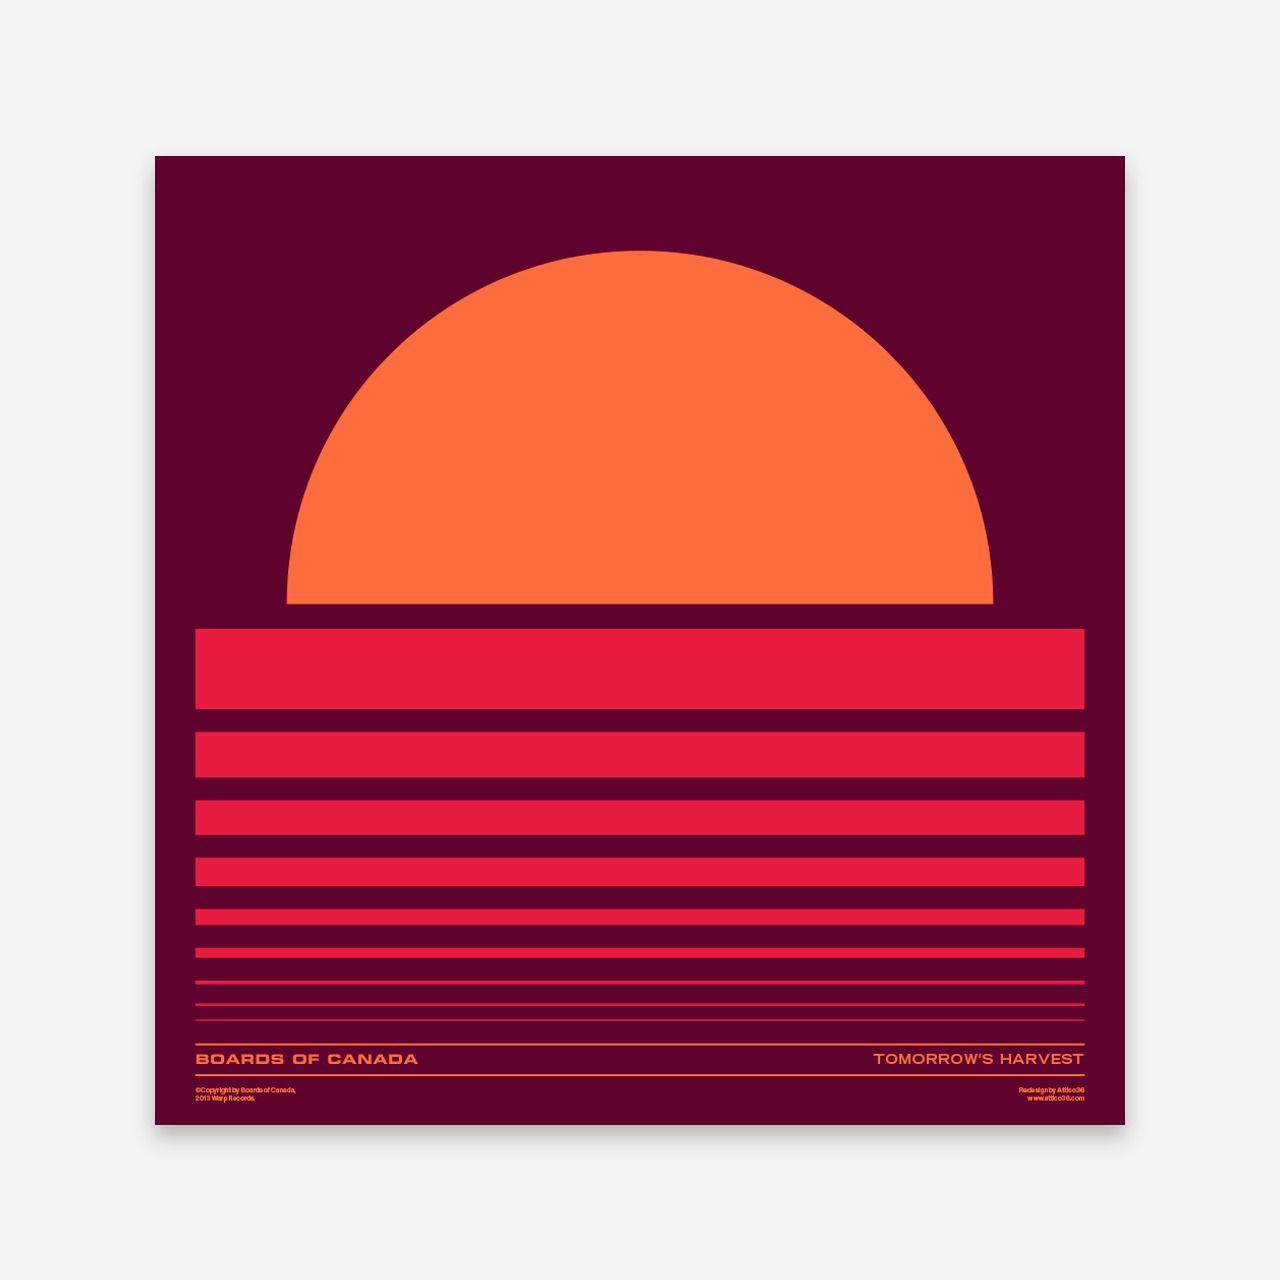 Boards Of Canada Tomorrow S Harvest Vinyl Remake By Attico36 Boards Of Canada Modern Graphic Design Canada Art